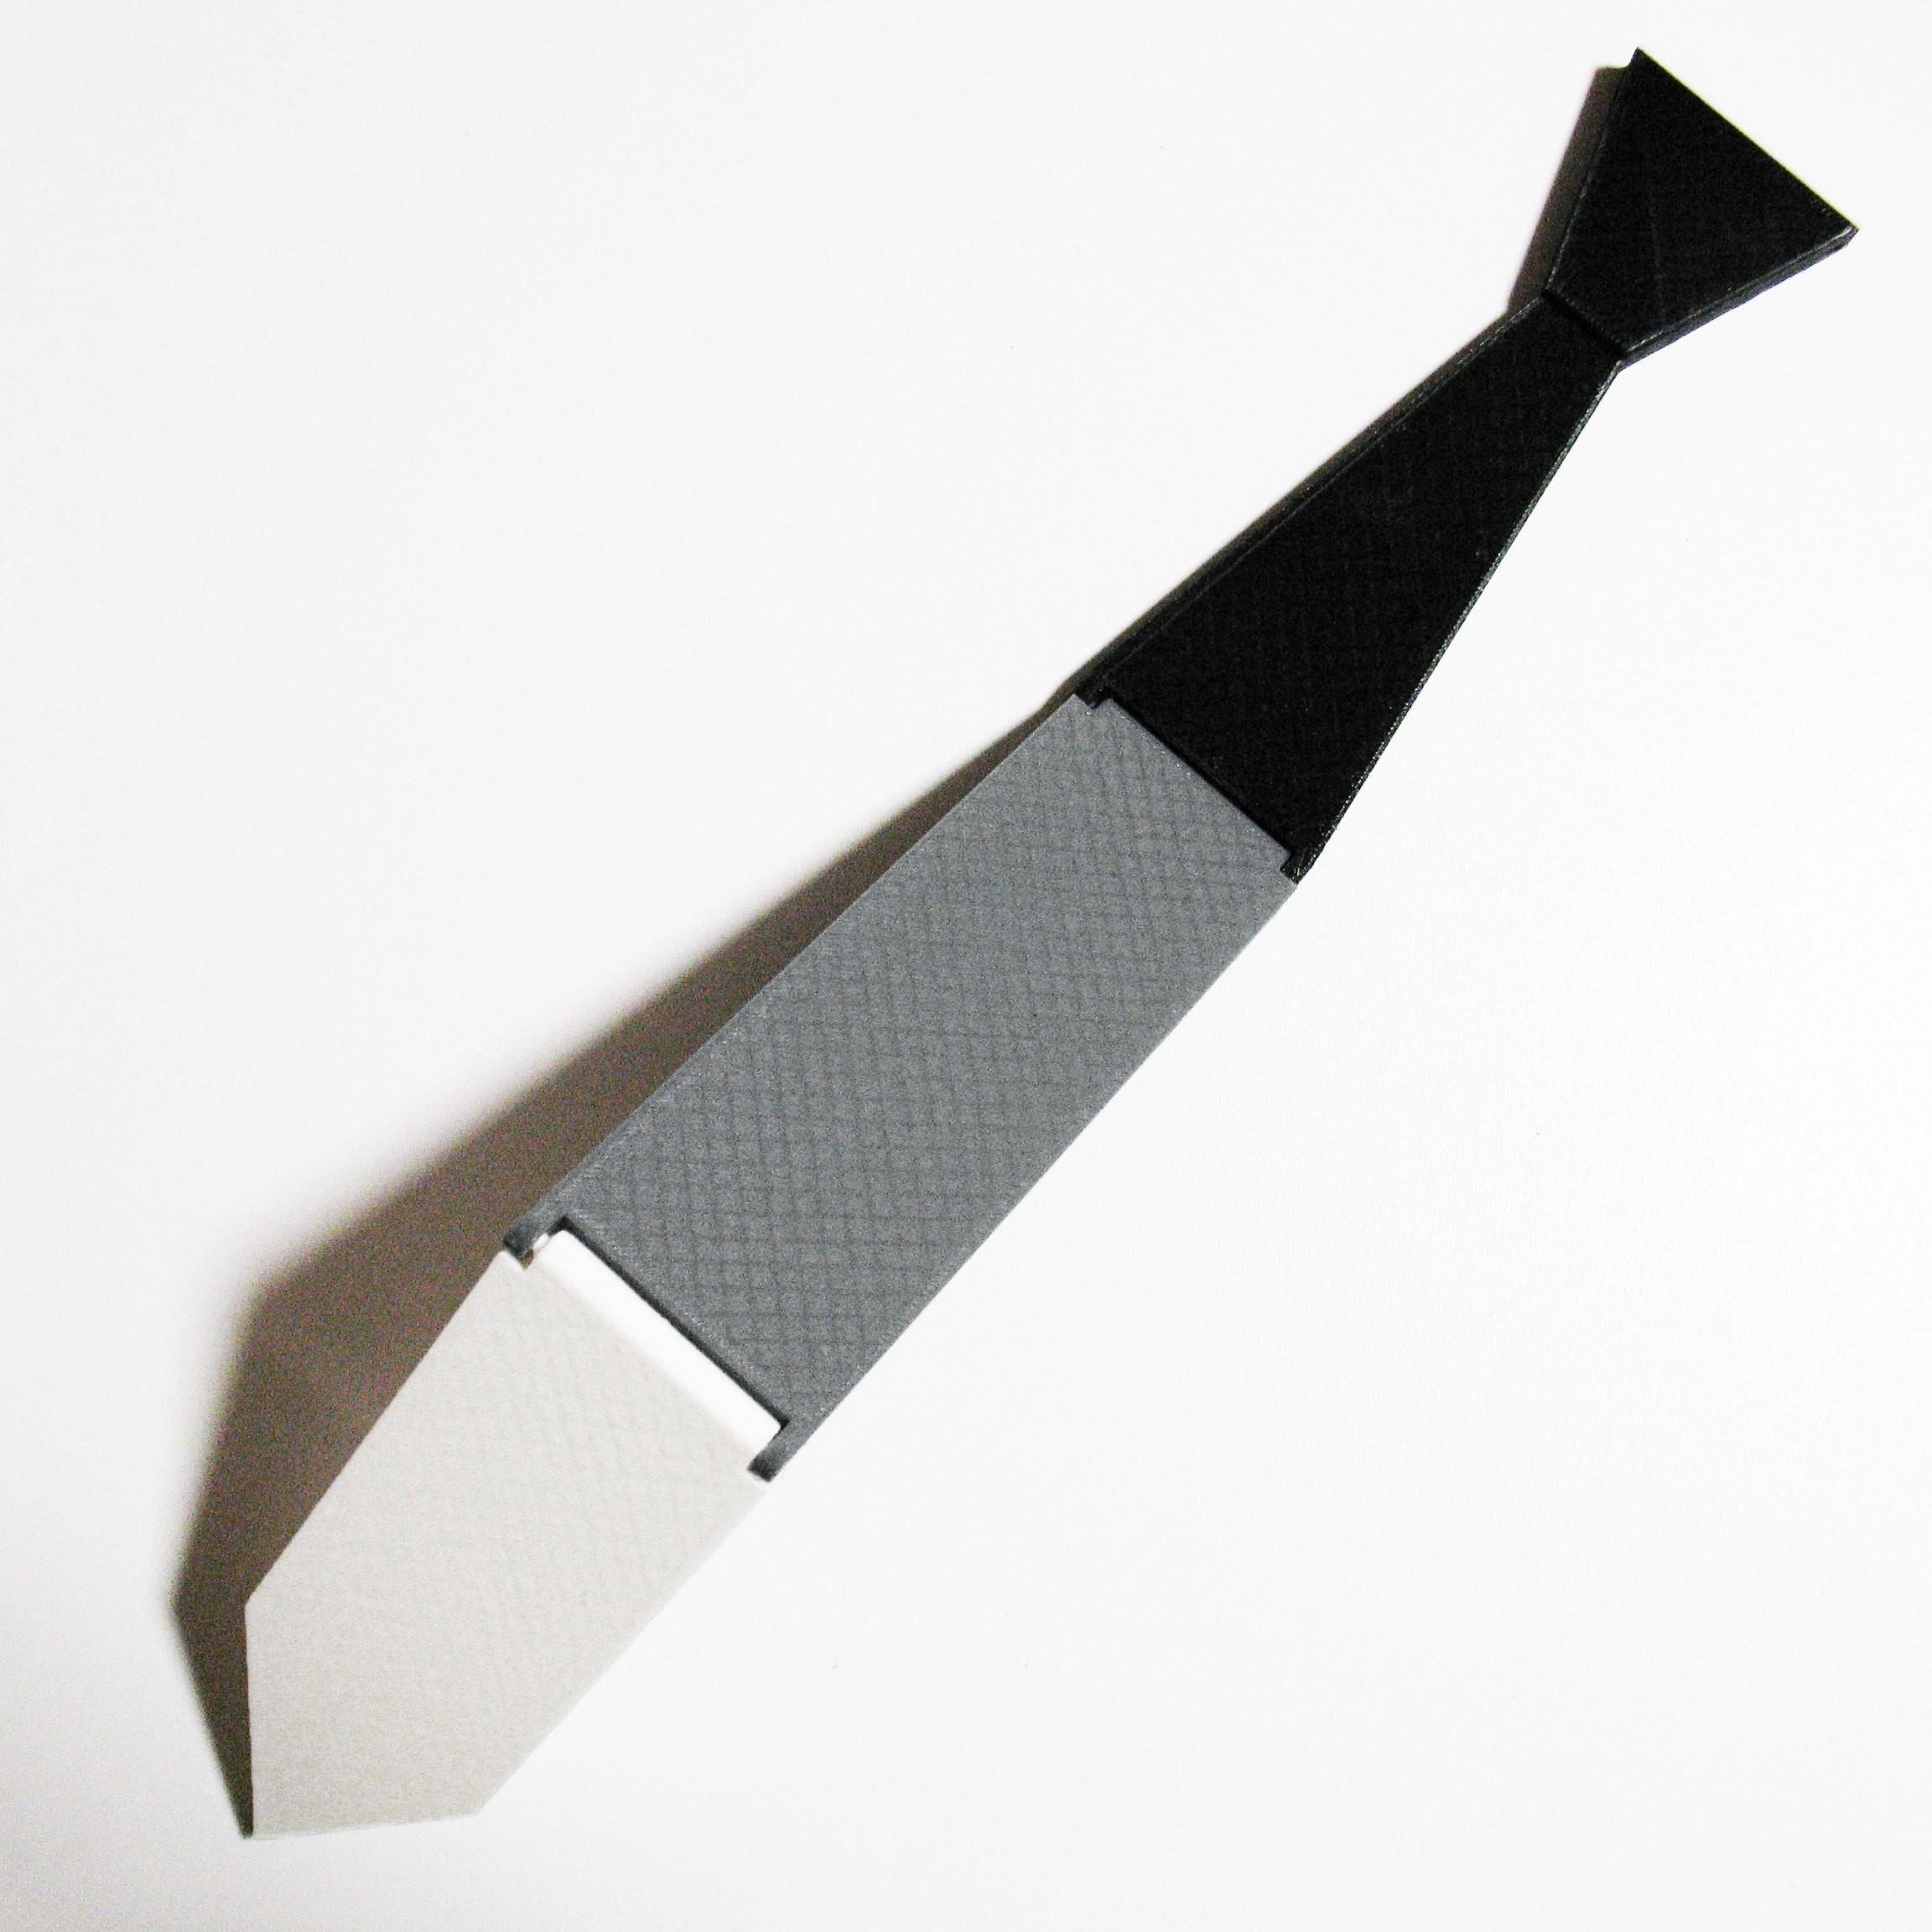 tie_m08w.jpg Download STL file tie • 3D printing model, polkhov